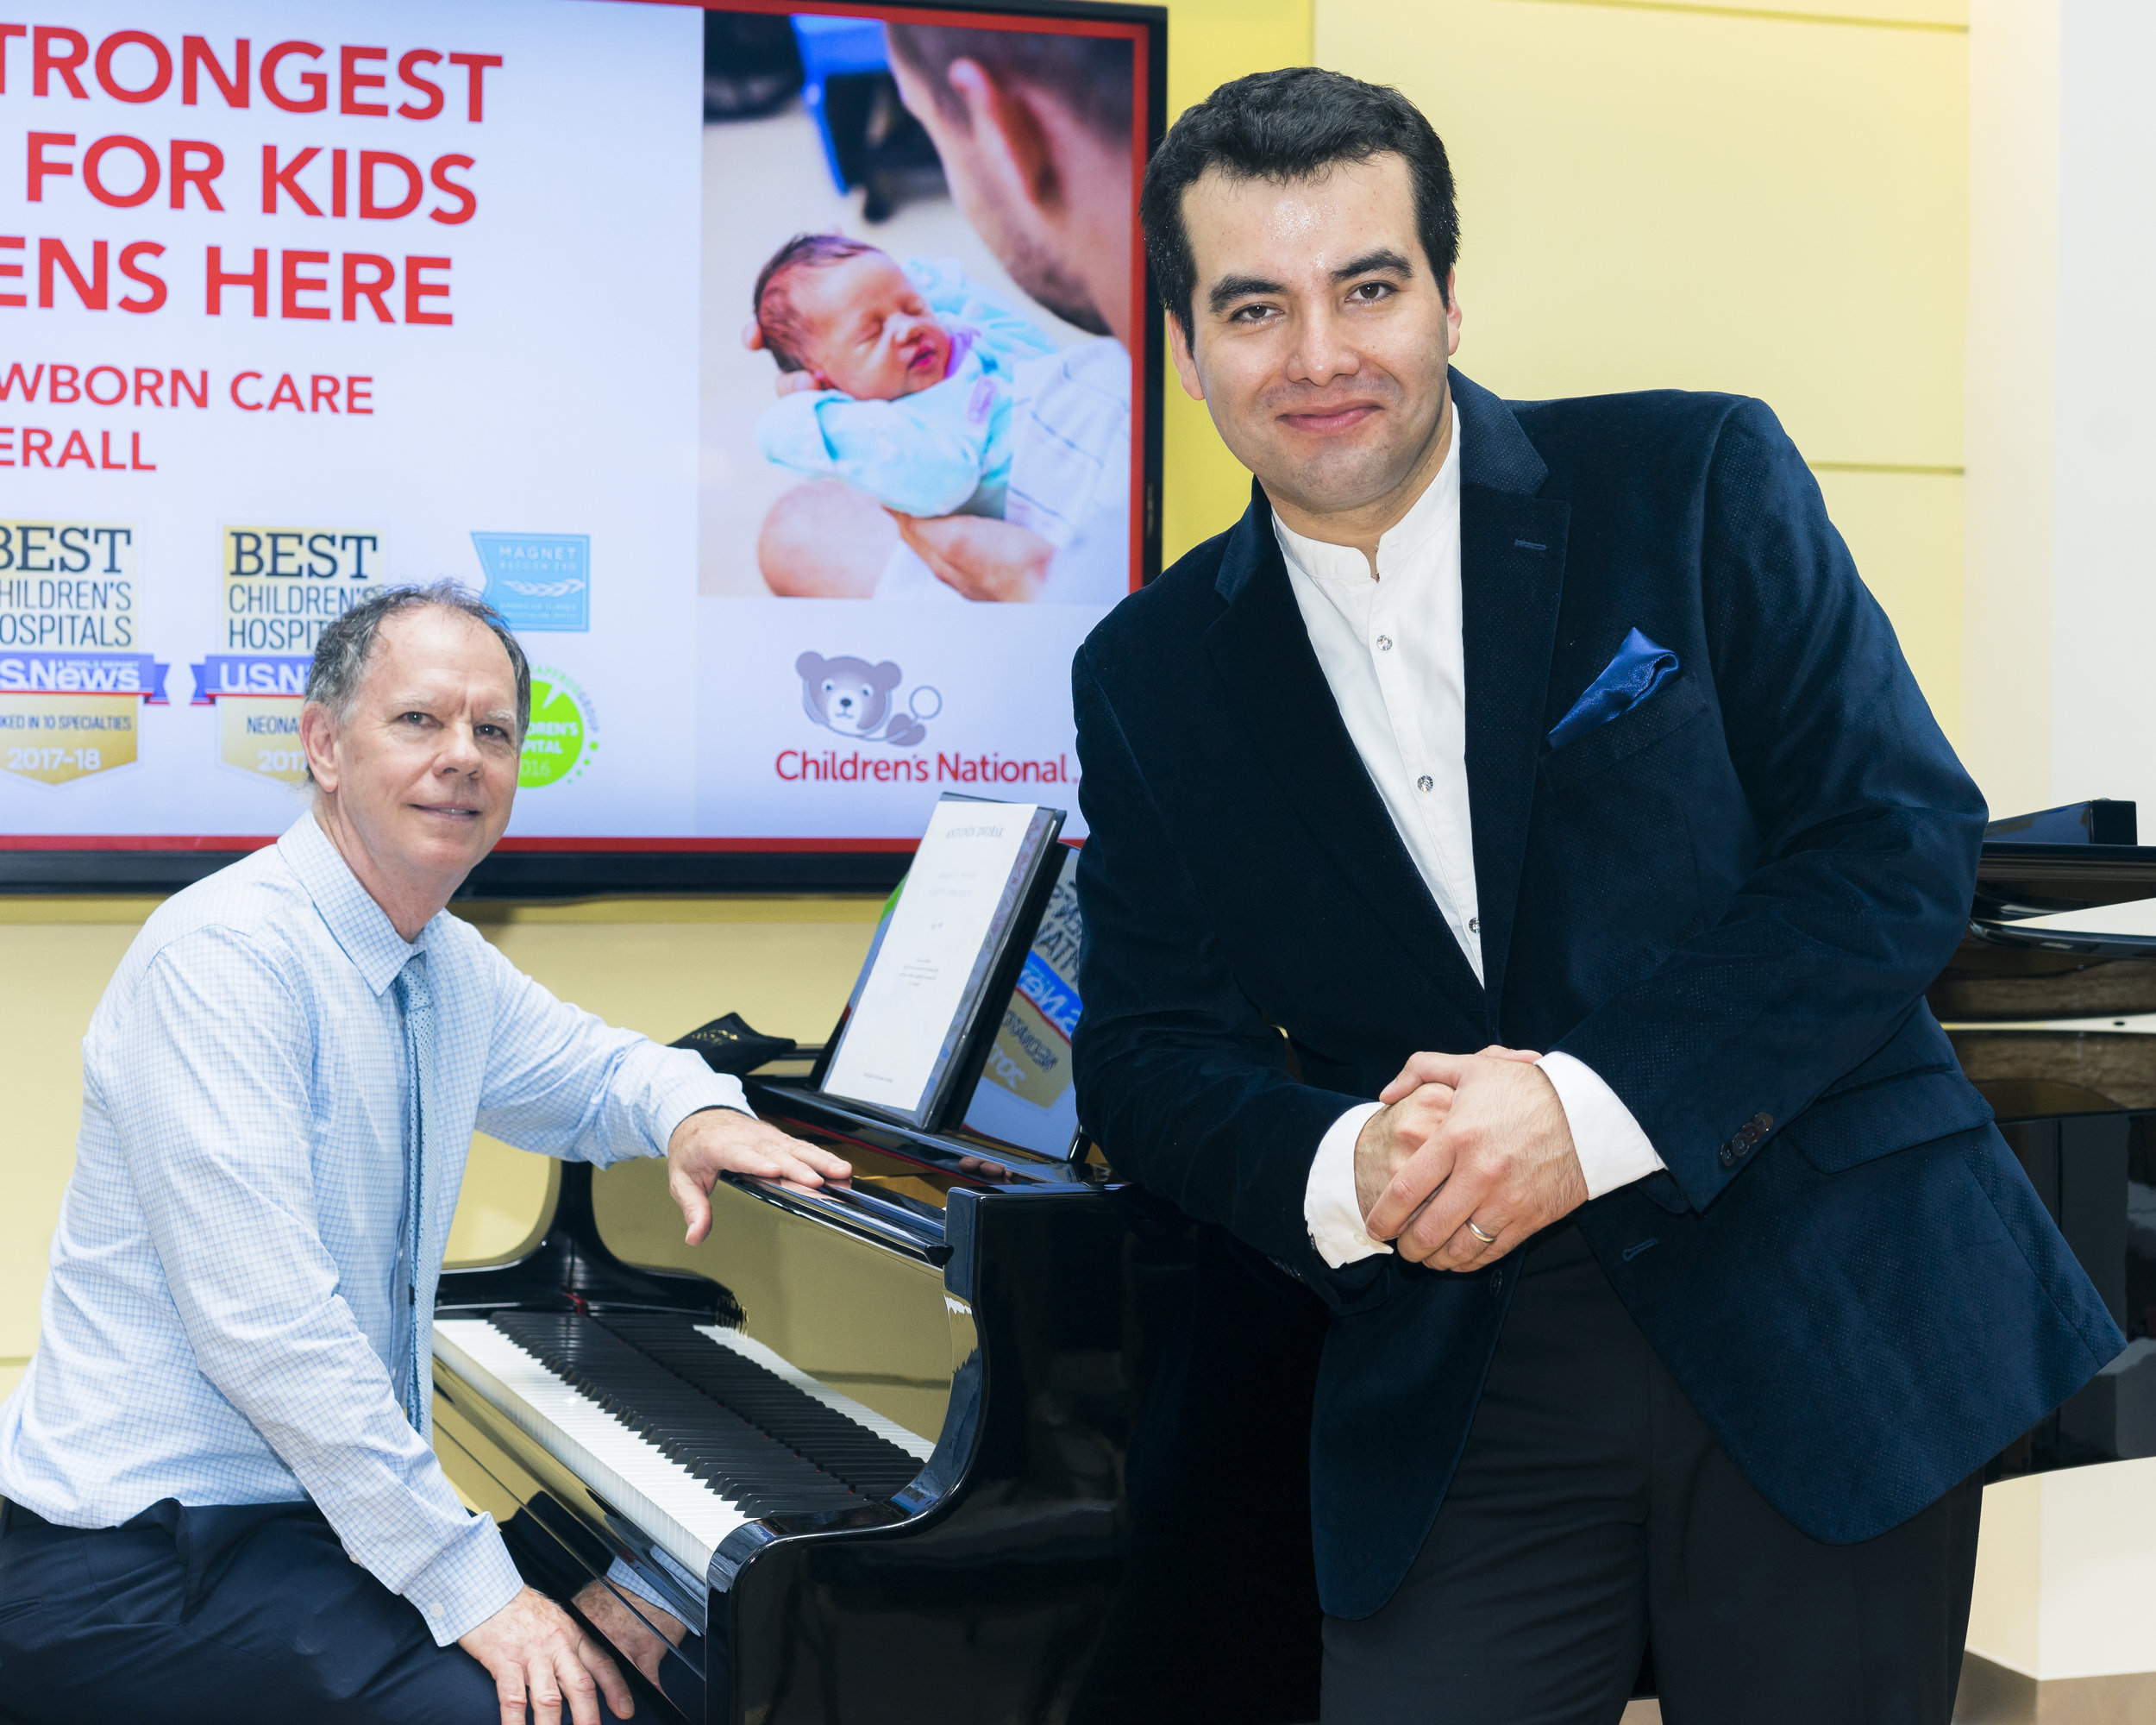 MDLO Founder Brad Clark and Baritone Javier Arrey at Children's National Medical Center.